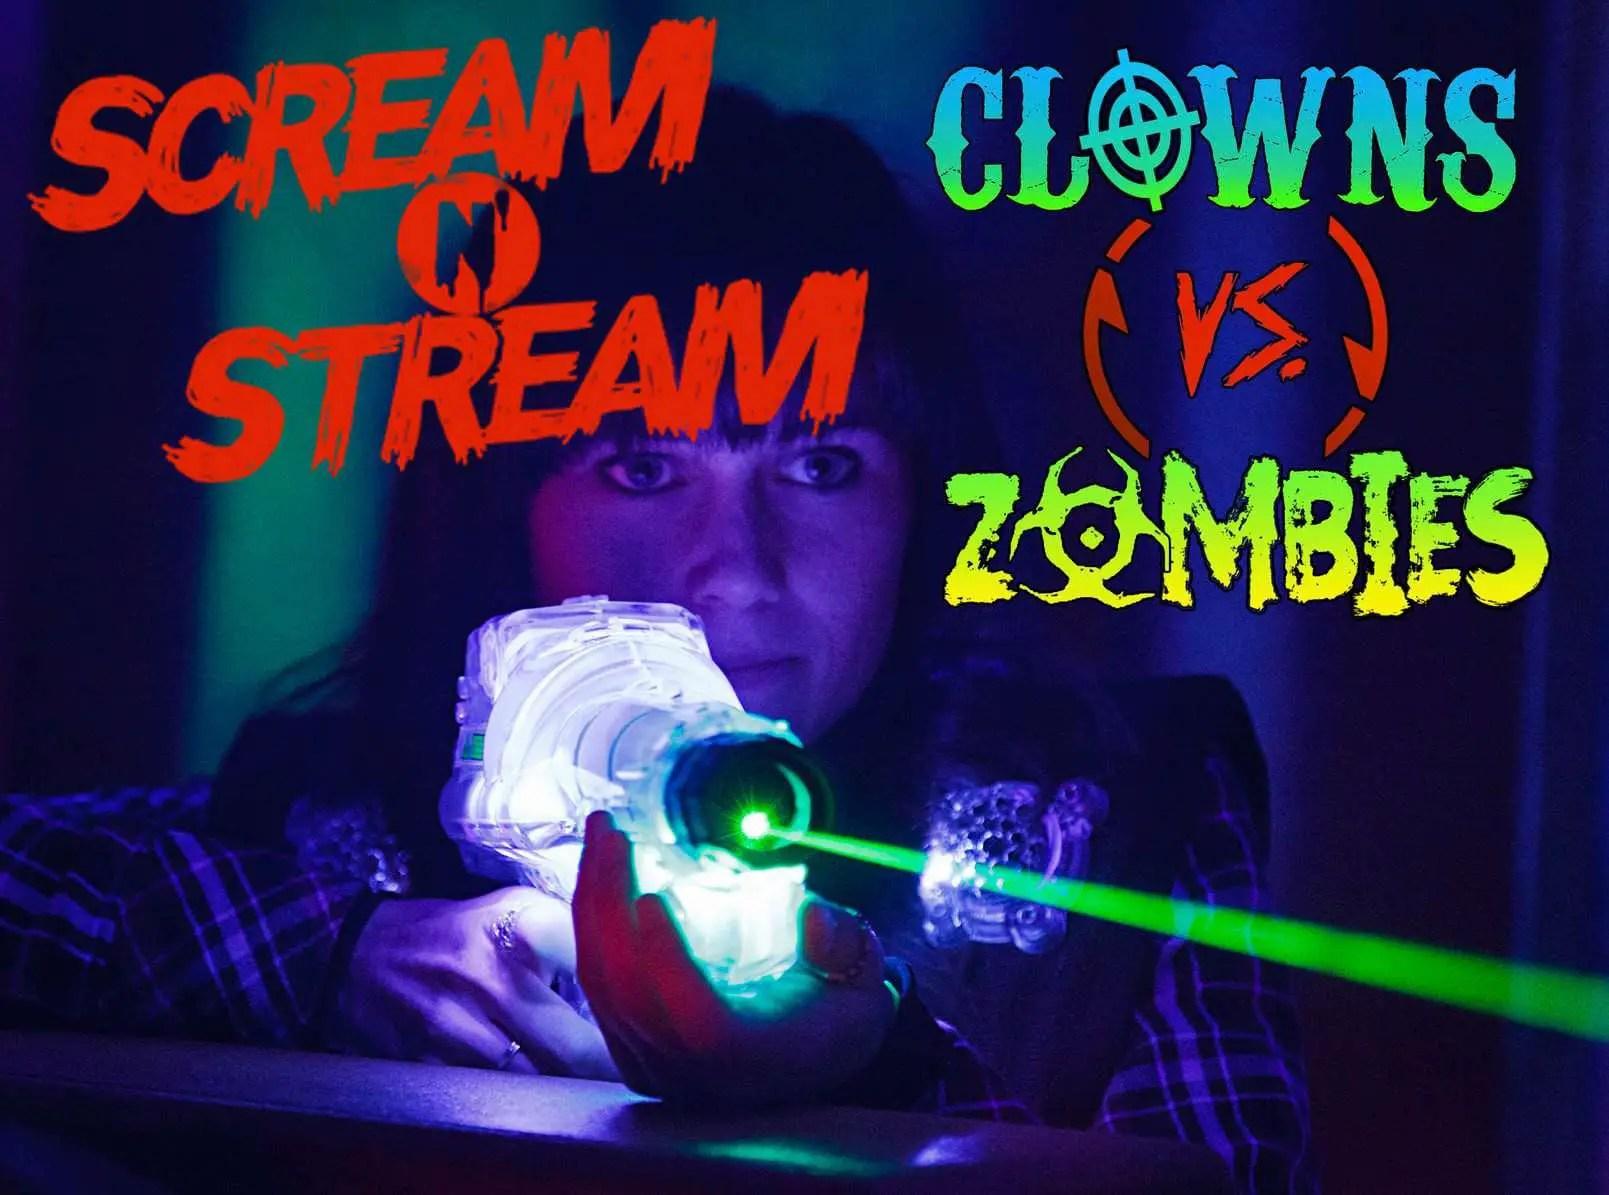 Scream N' Stream Haunted Drive-Thru - Orlando - FL - Haunted House - Drive Thru Experience